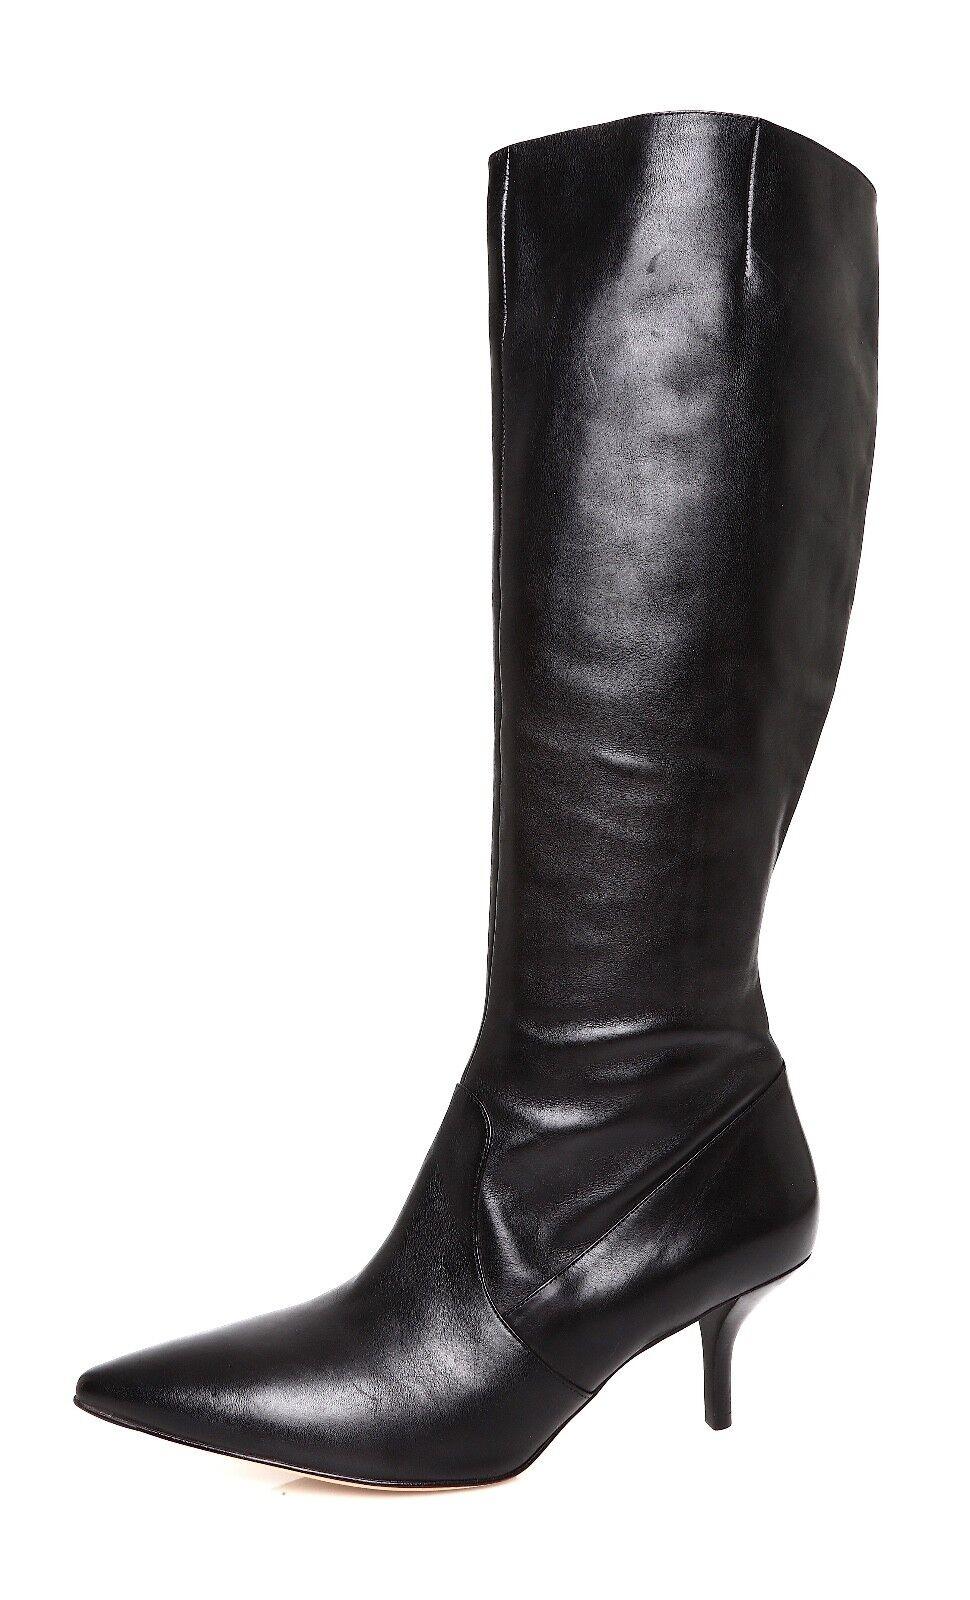 Via Spiga Garyn Mid Heel Women's Black Leather Boot Sz 9.5 M 4497